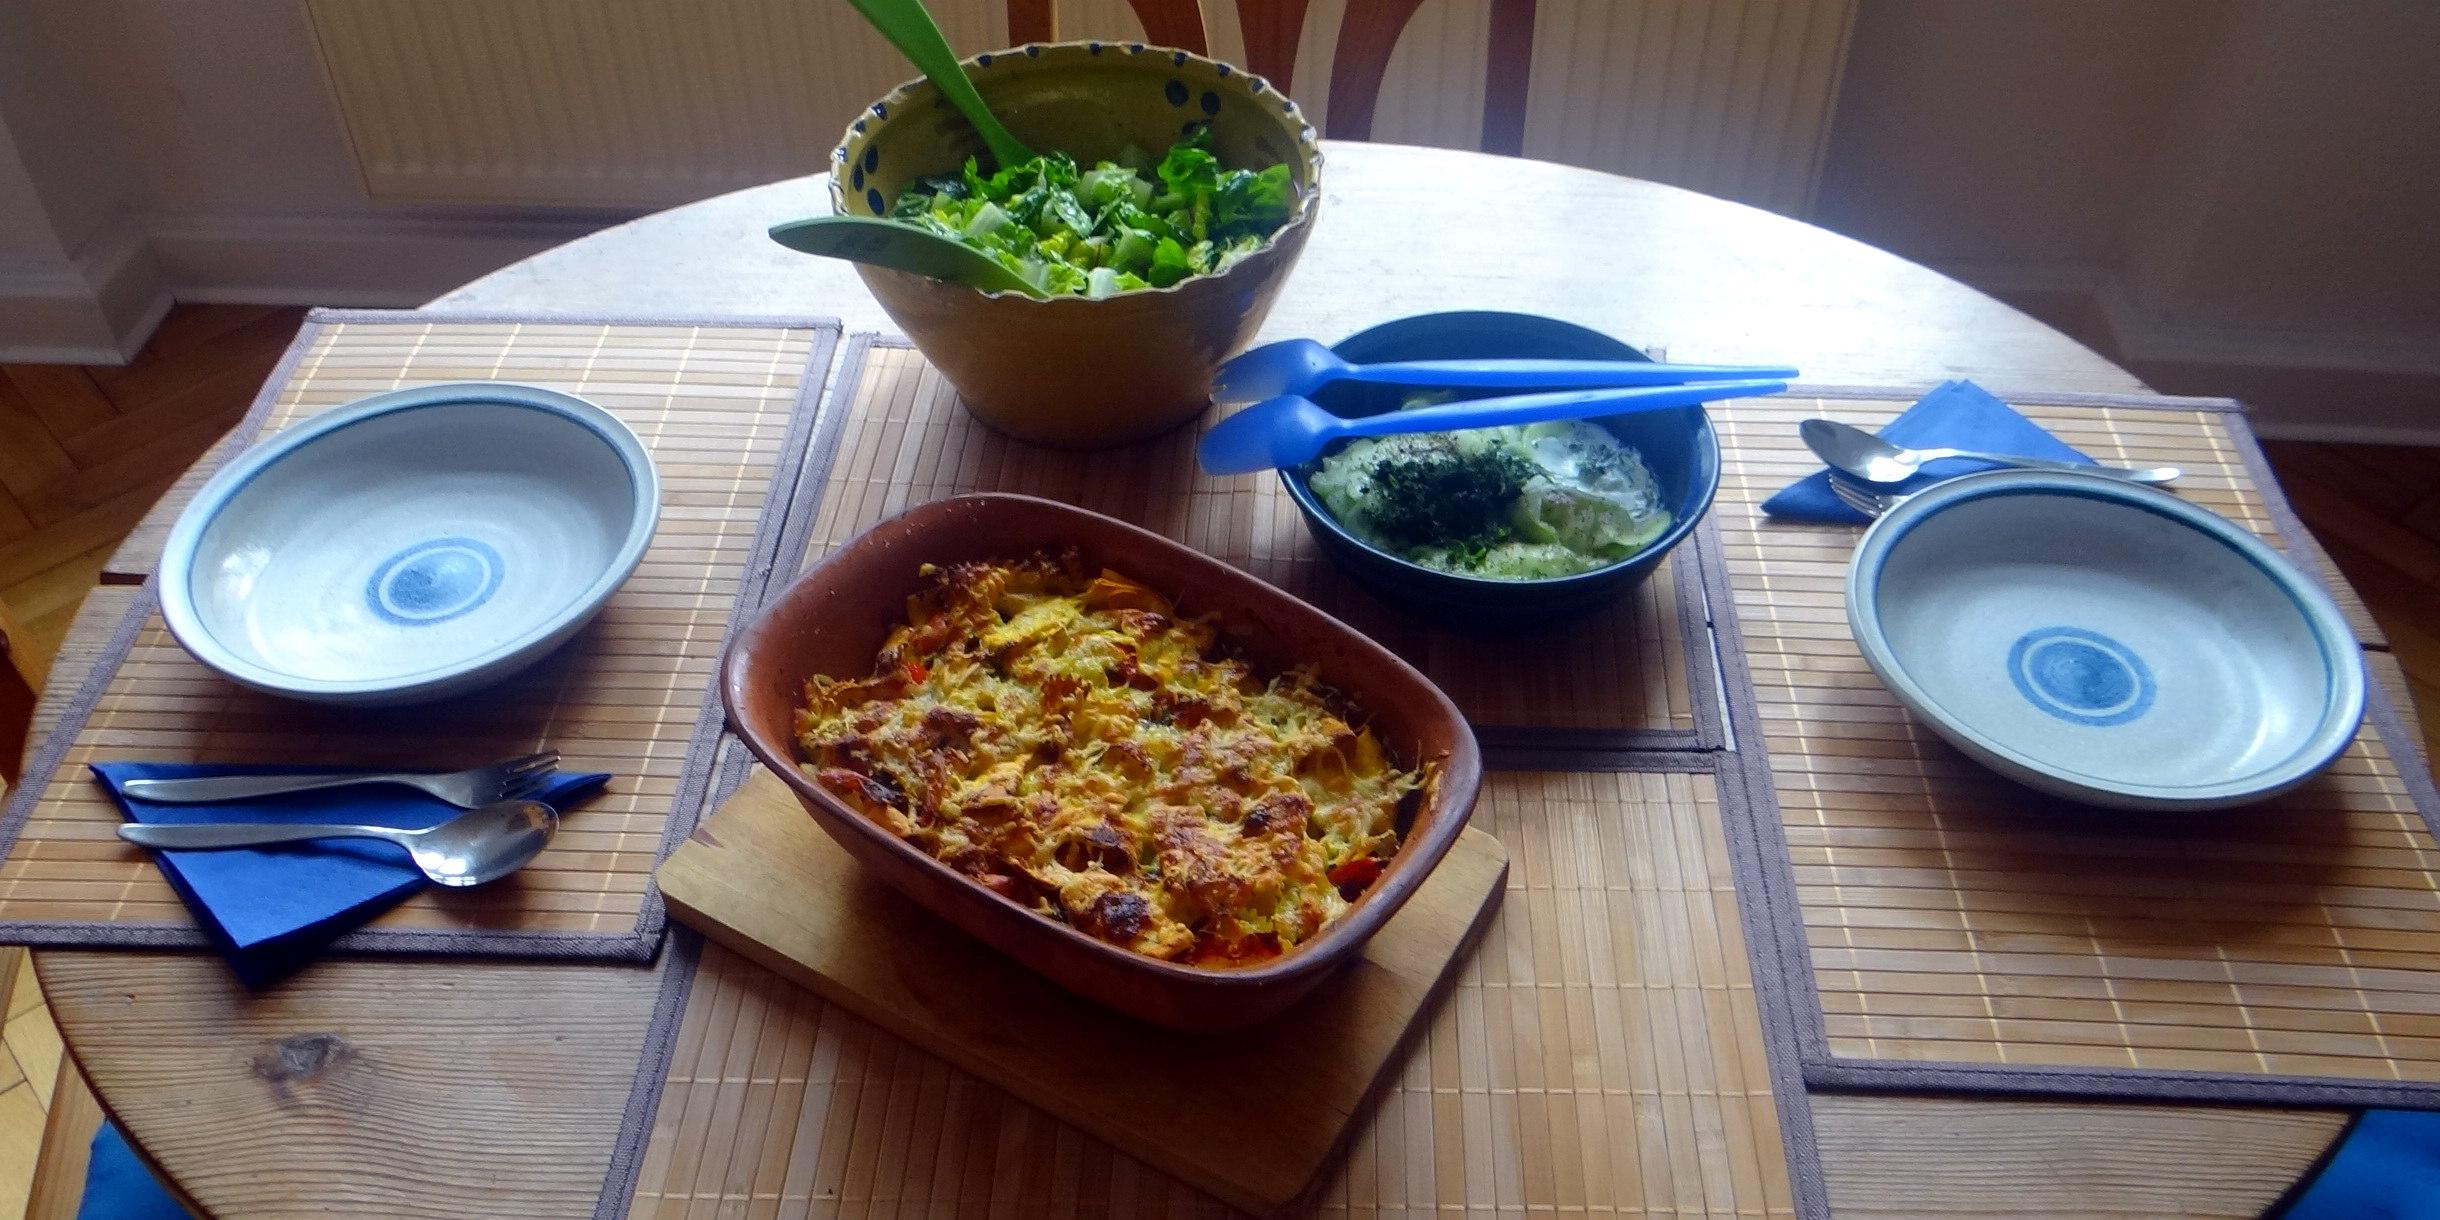 Resteessen,Gurkensalat,Romasalat (3)